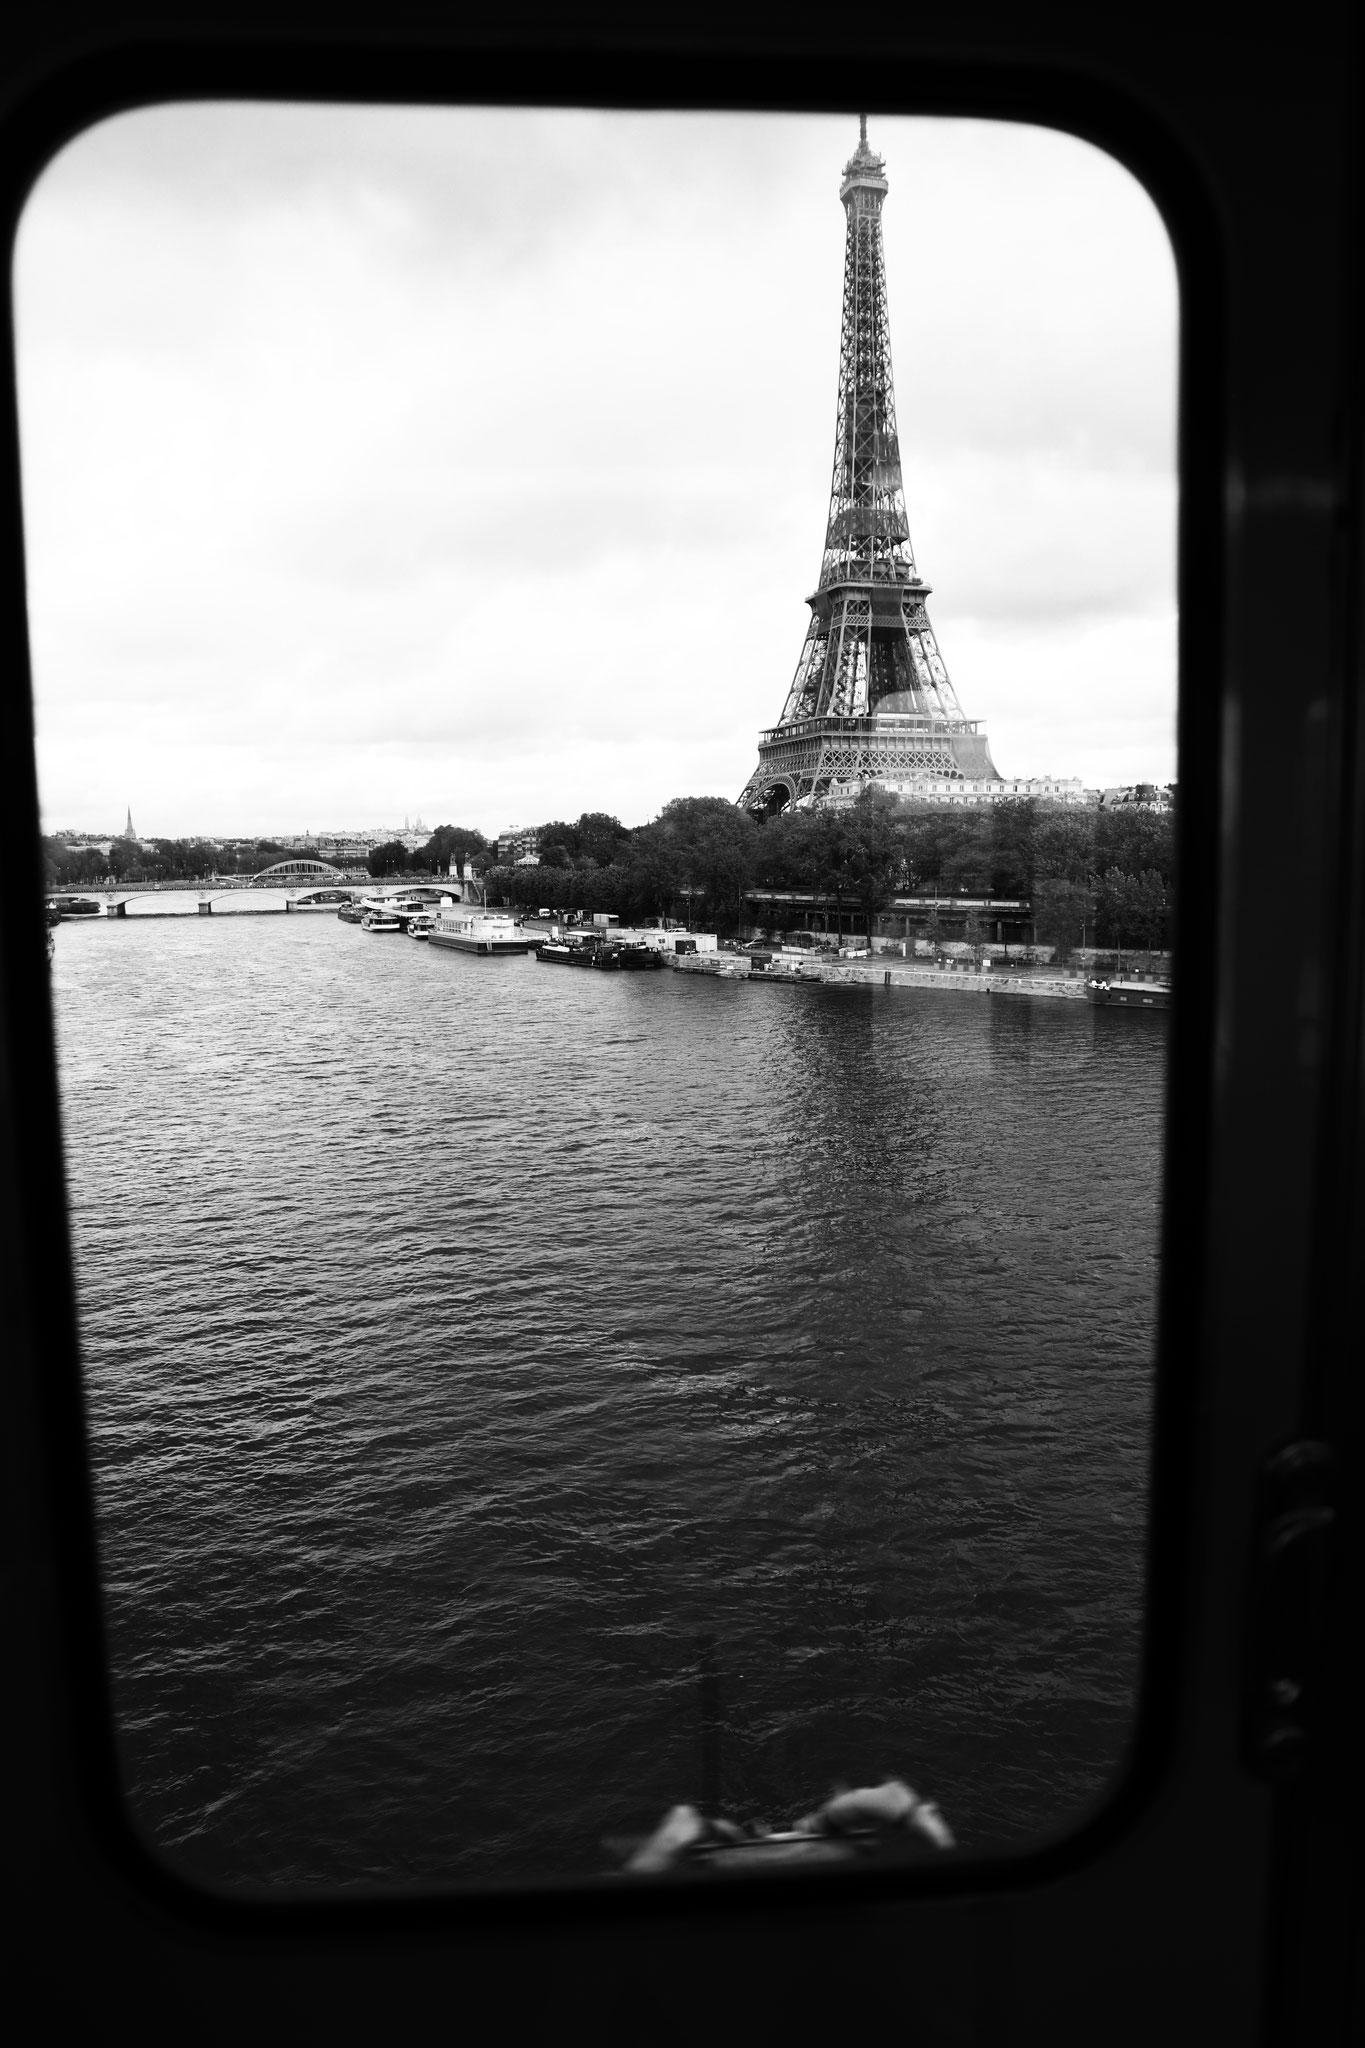 """Iron lighthouse"" - Pont de Bir-Hakeim (M°6), Paris (2021). Canon 5D Mark IV + 24-105mm. ©Clémence Rougetet"